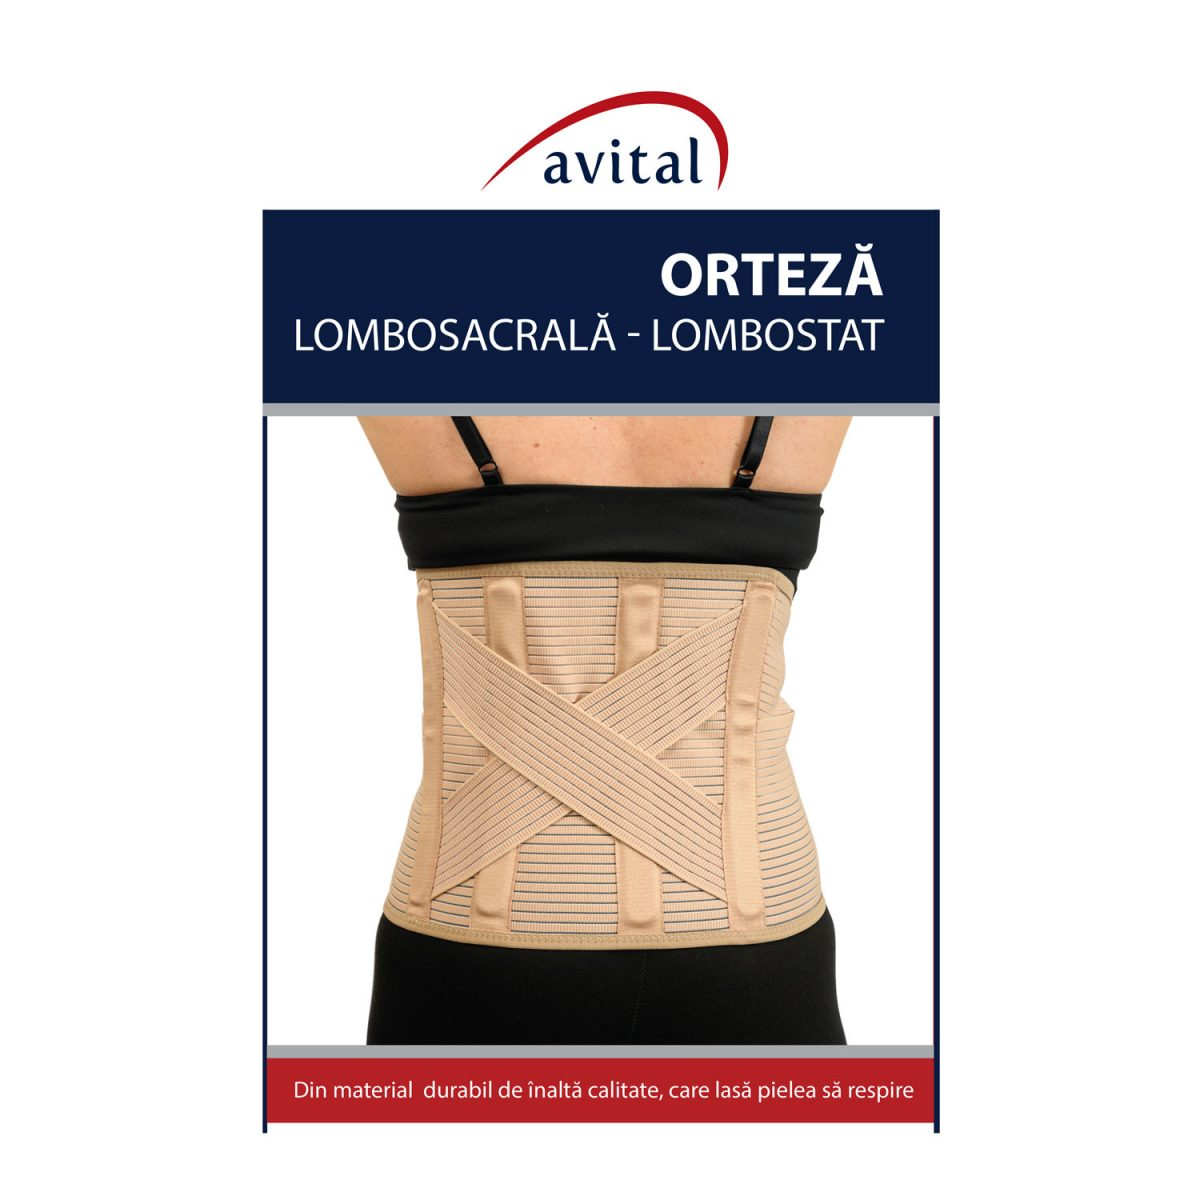 Lombostat/Orteza lombosacrala VL-10009